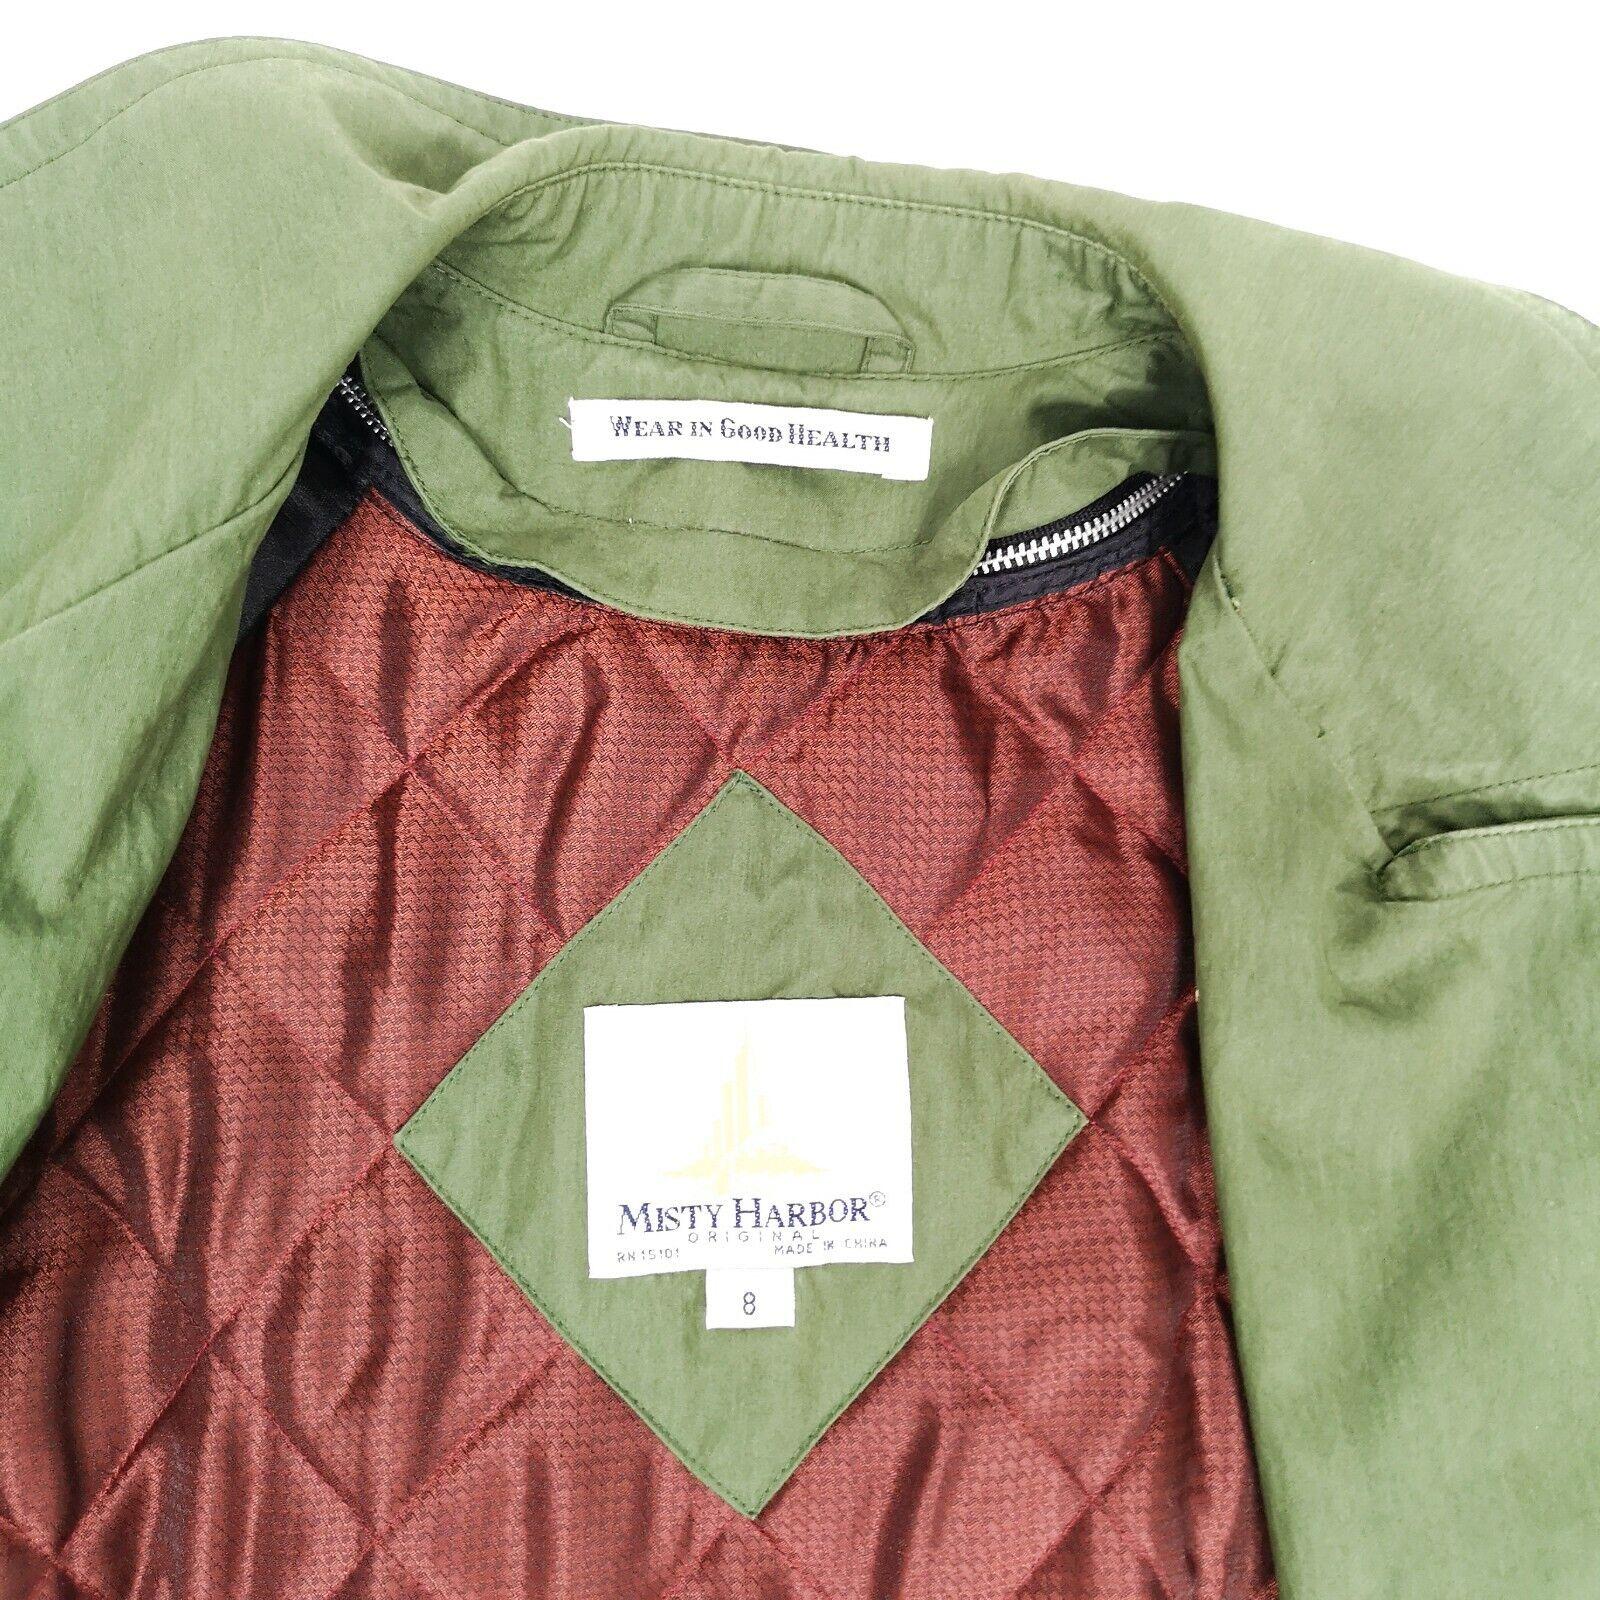 MISTY HARBOR Trench Coat Jacket 8 Olive Green - image 3